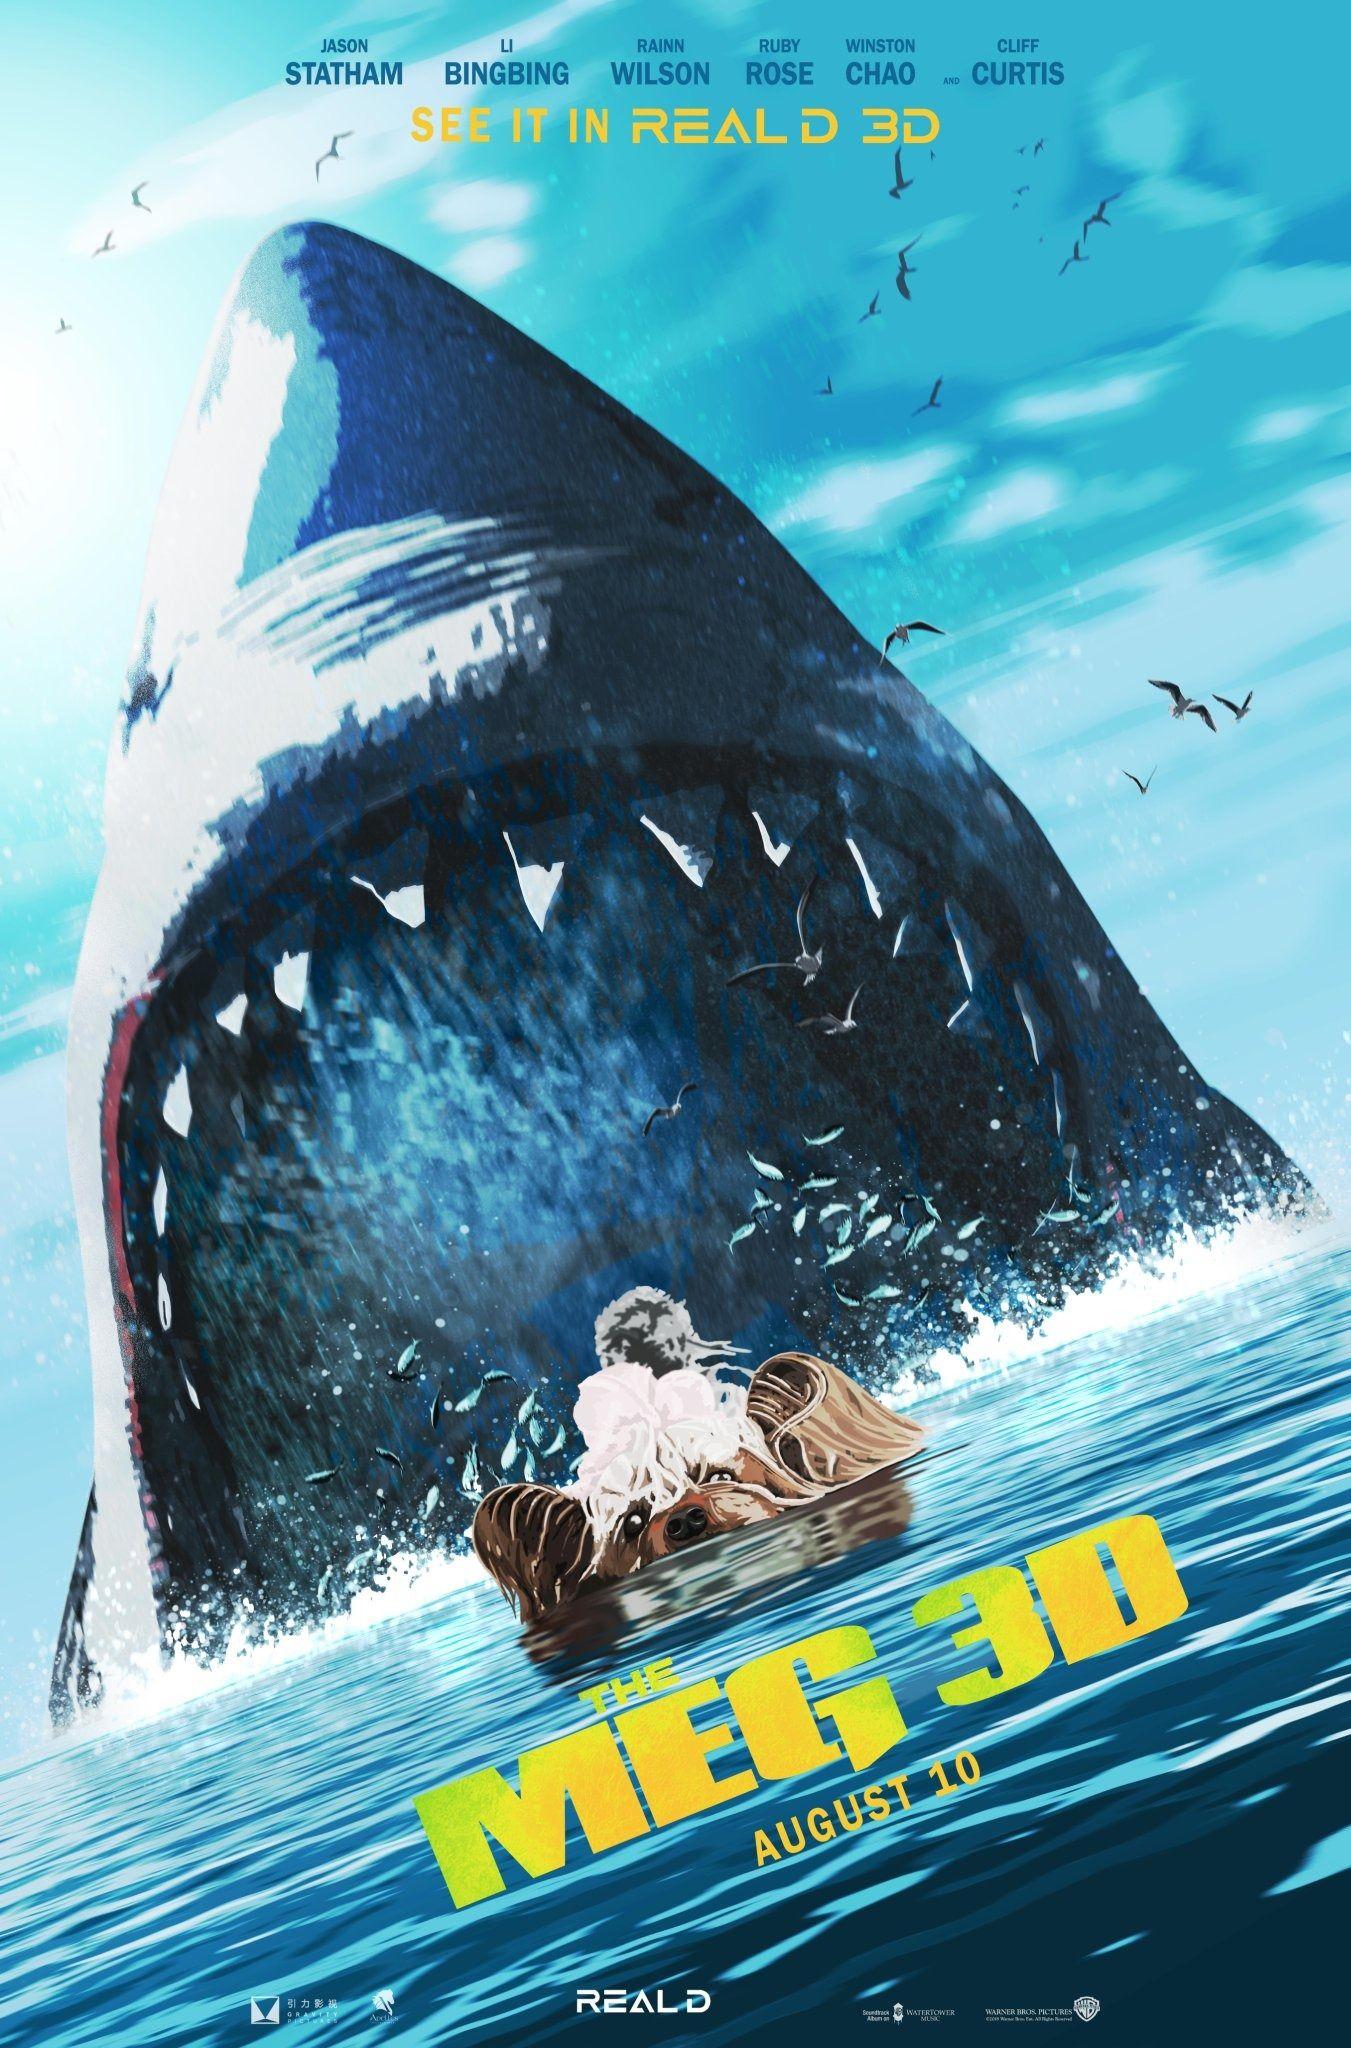 Amor En Fin Movie Online the meg | meg movie, new movie posters, movie posters